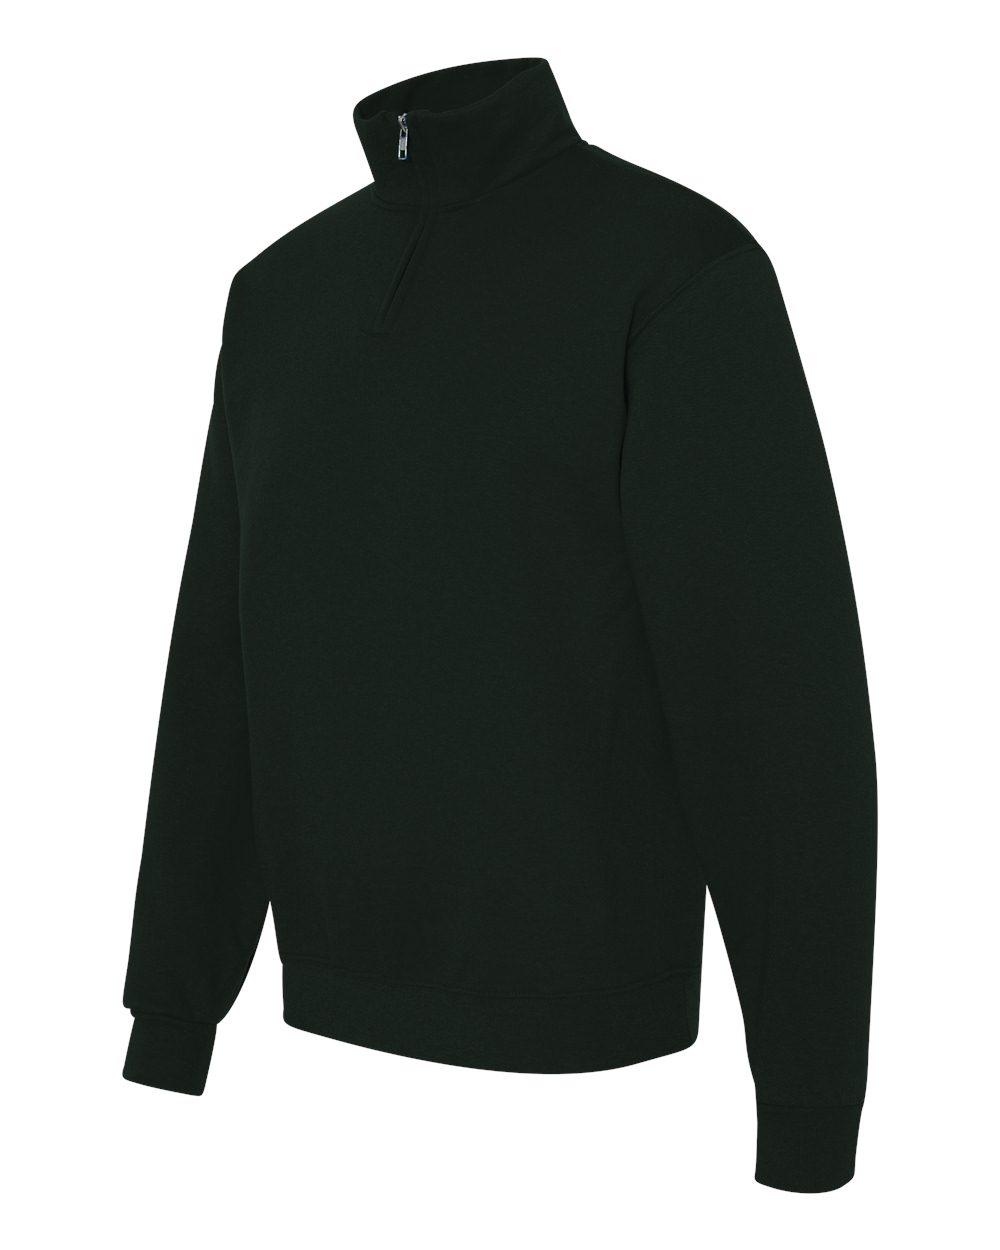 50//50 NuBlend Quarter-Zip Cadet Collar Sweatshirt 995M -CHARCOAL GREY-L Jerzees mens 8 oz